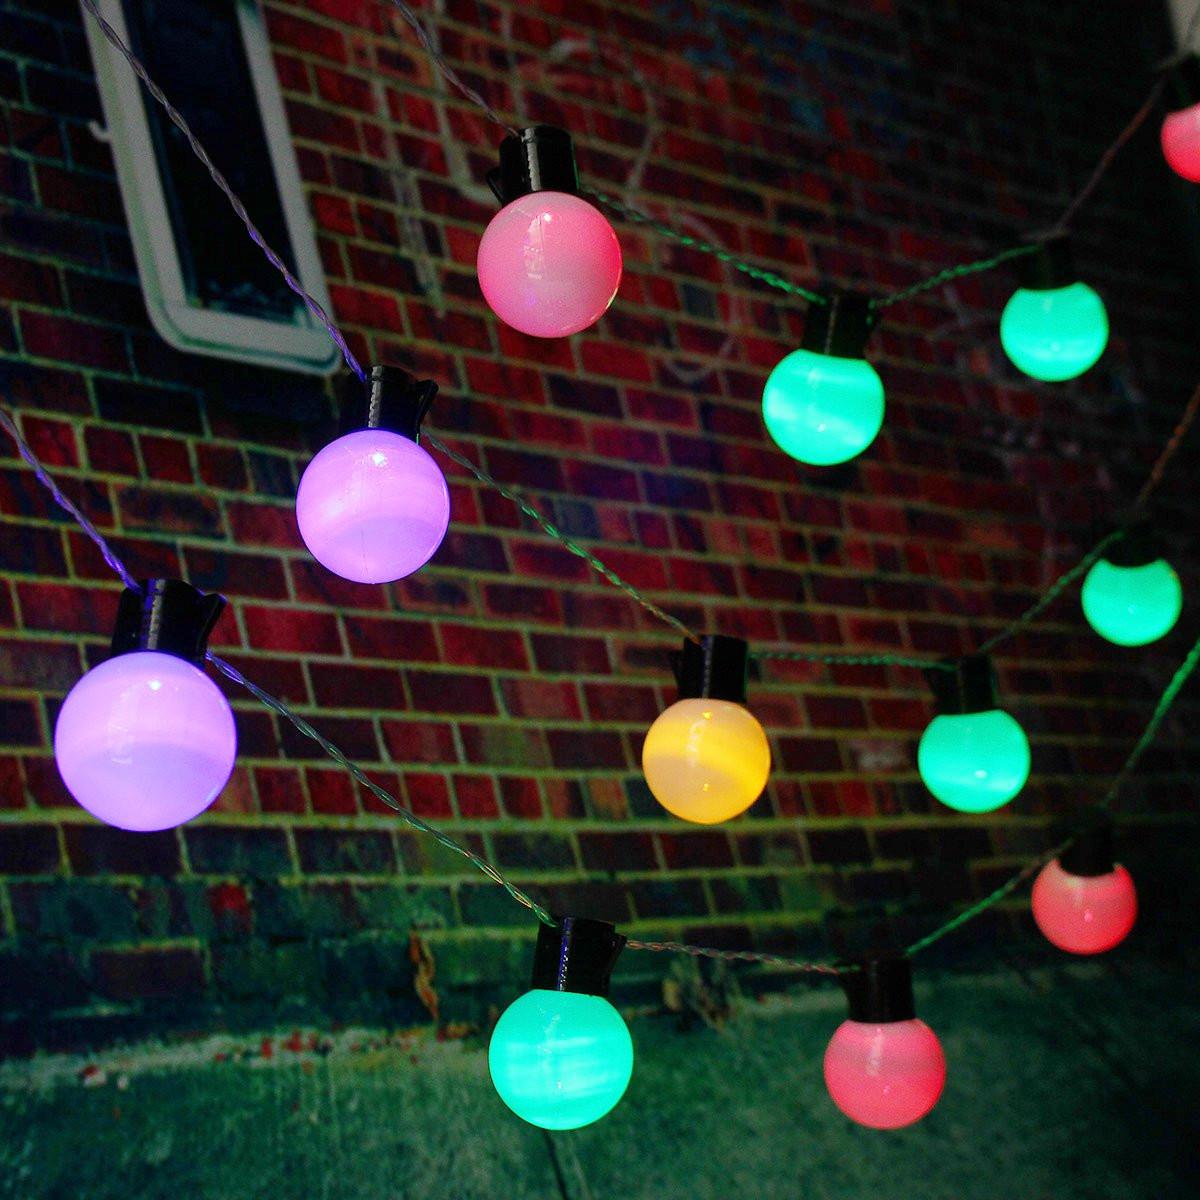 10m 38 Balls LED String Fairy Lights Party Xmas Wedding Holiday Lamp 220V EU Plug